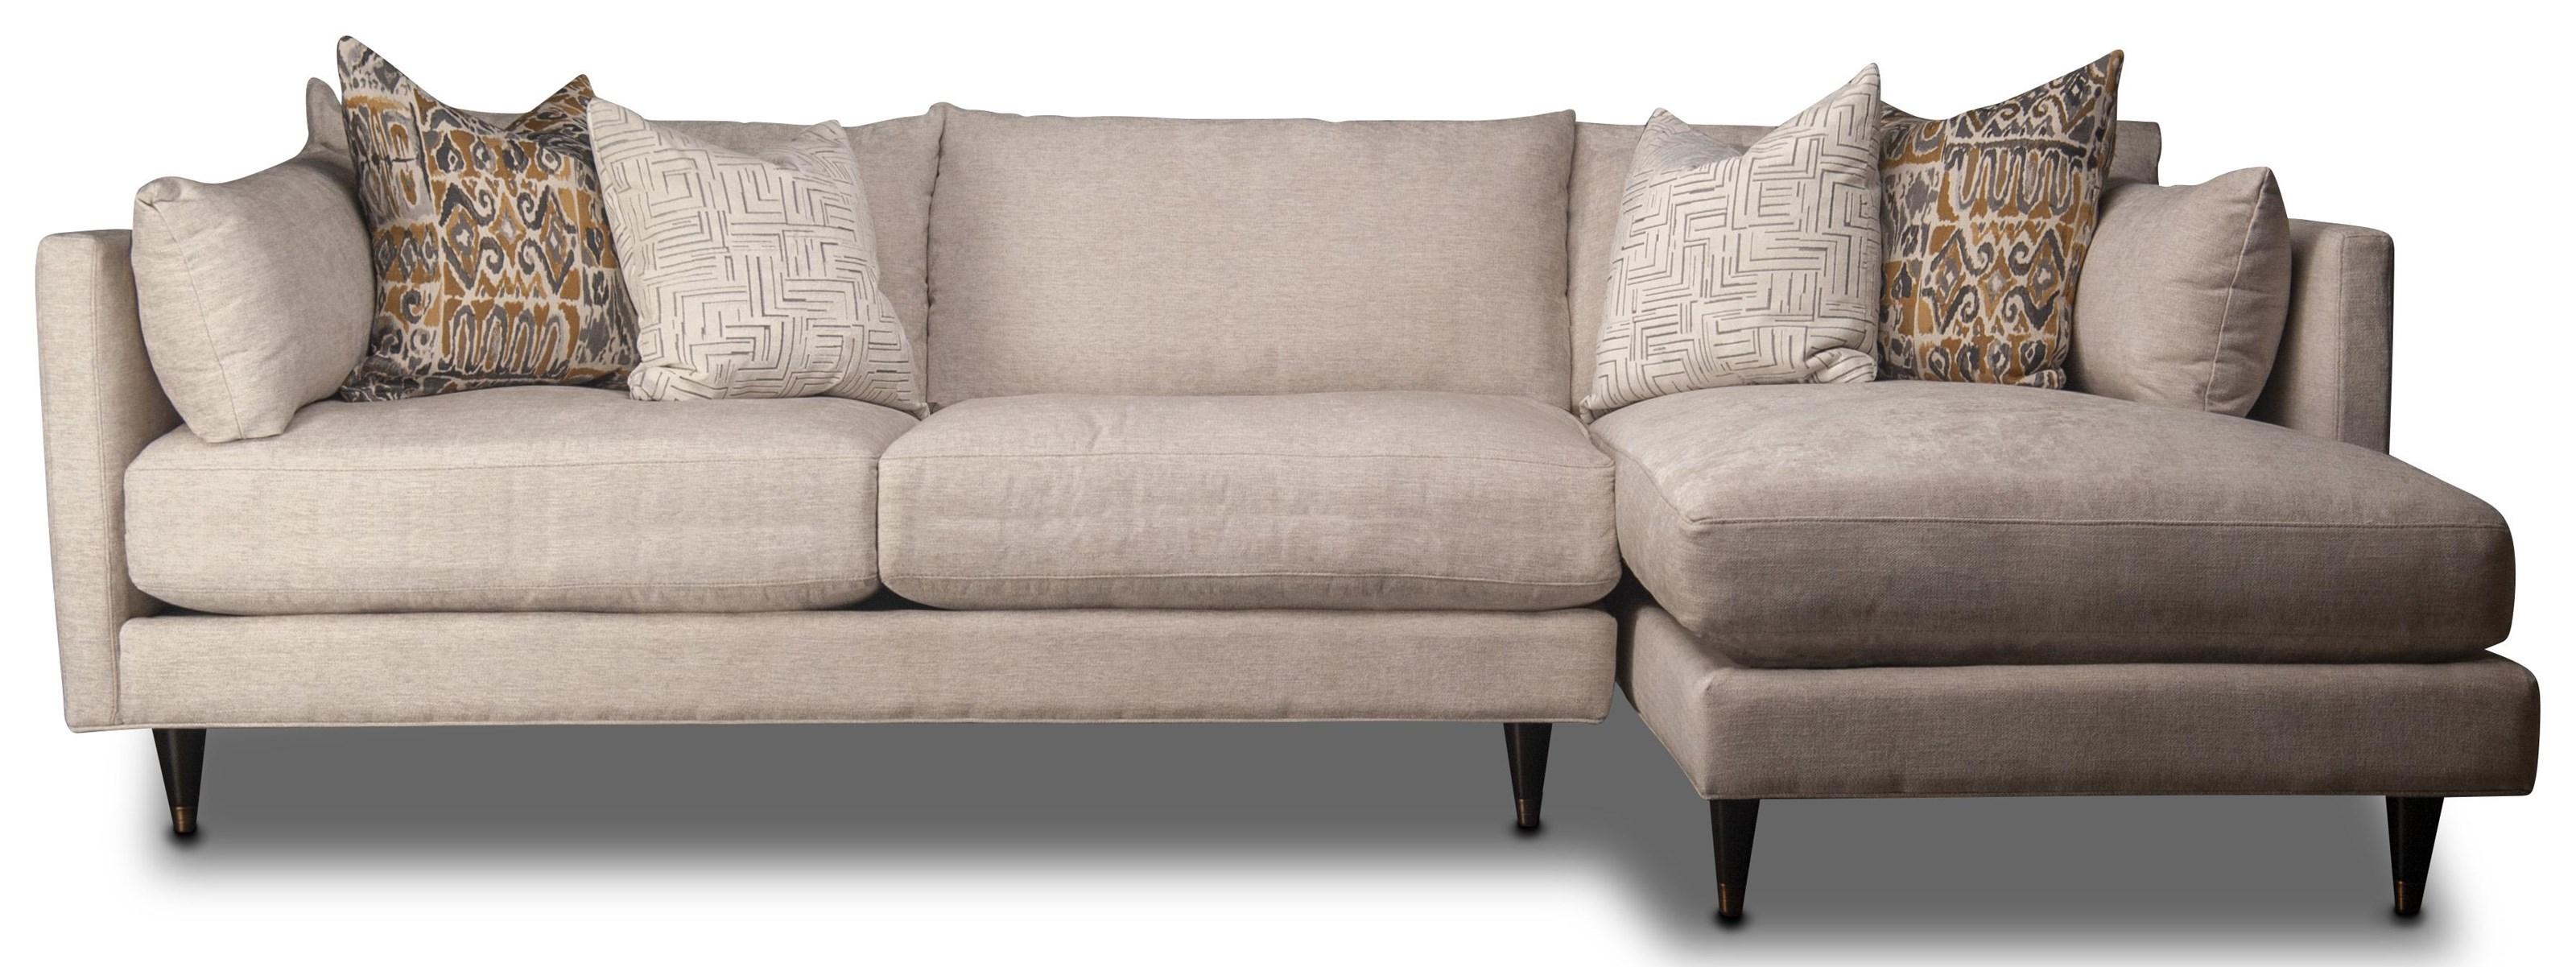 Baylis Baylis Sectional Sofa by Jonathan Louis at Morris Home